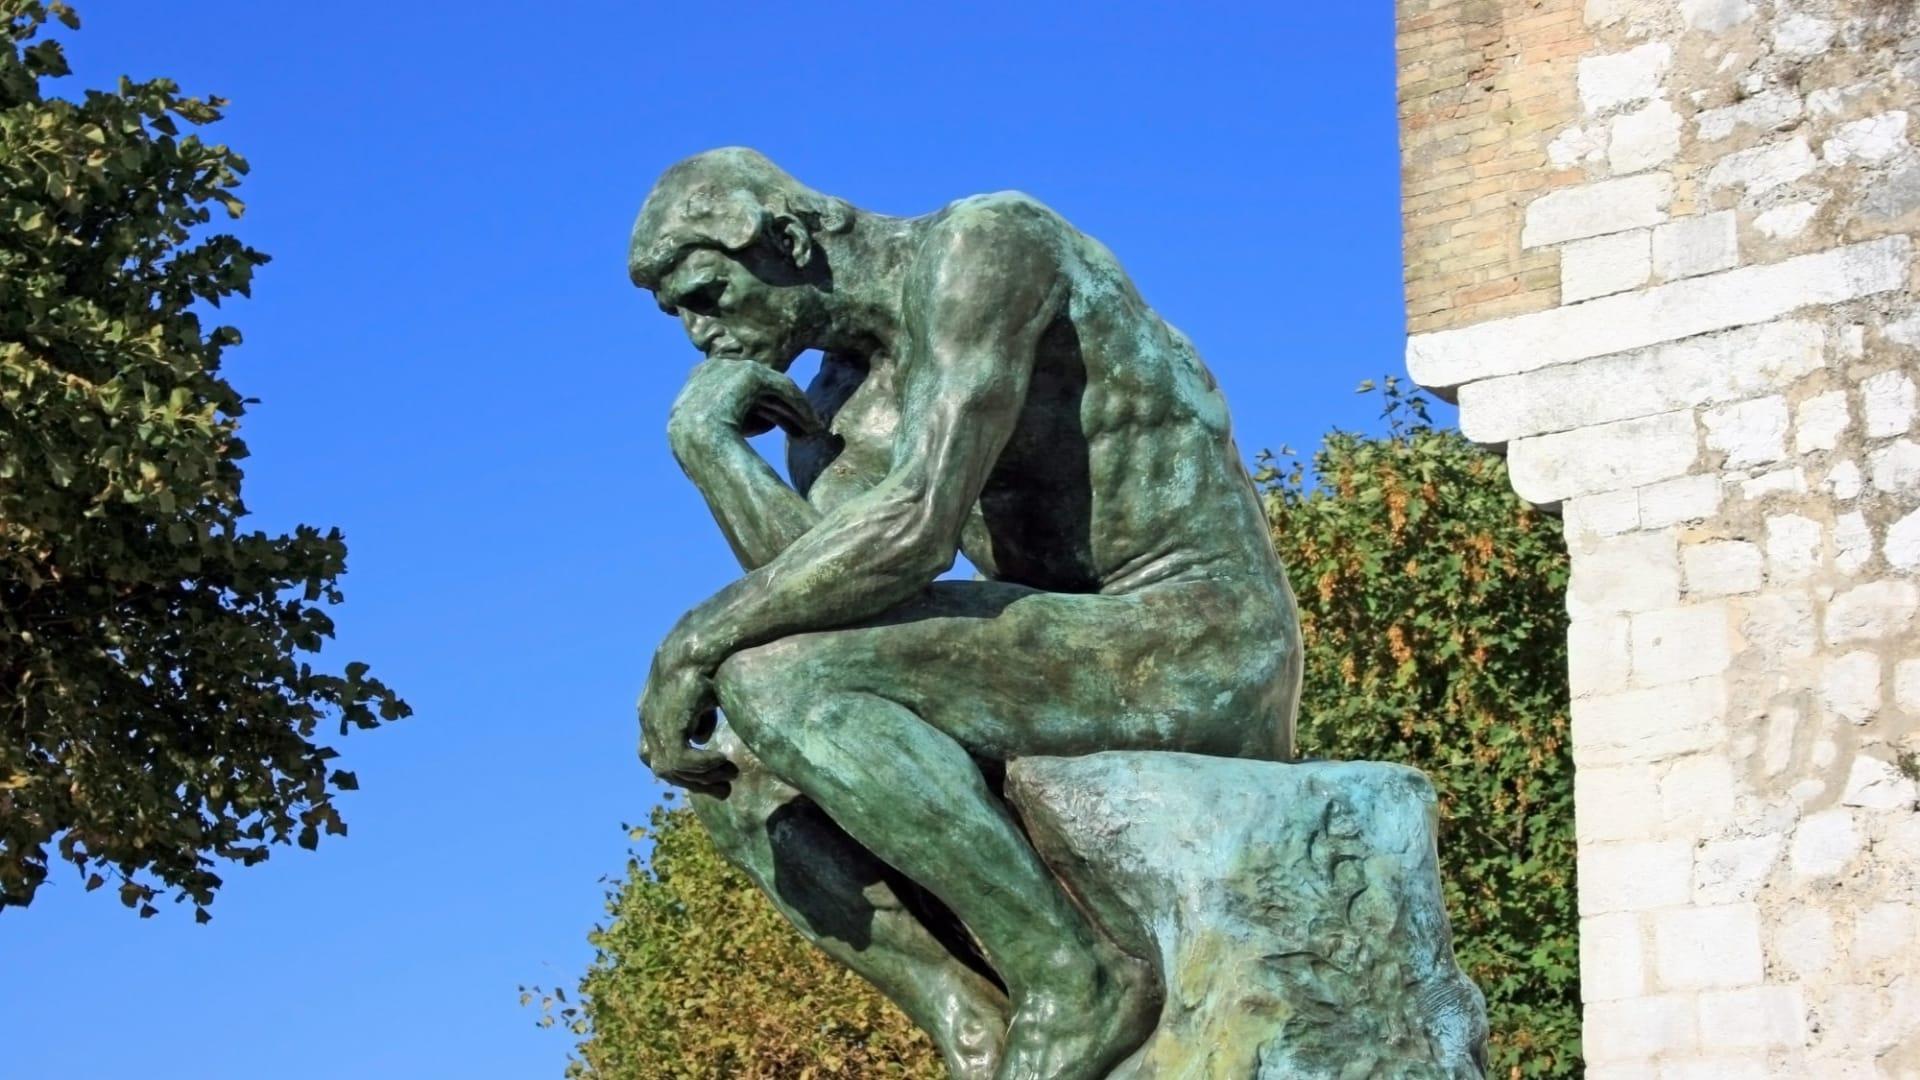 Gen-X Is More Creative Than Gen-Y, According to Harvard